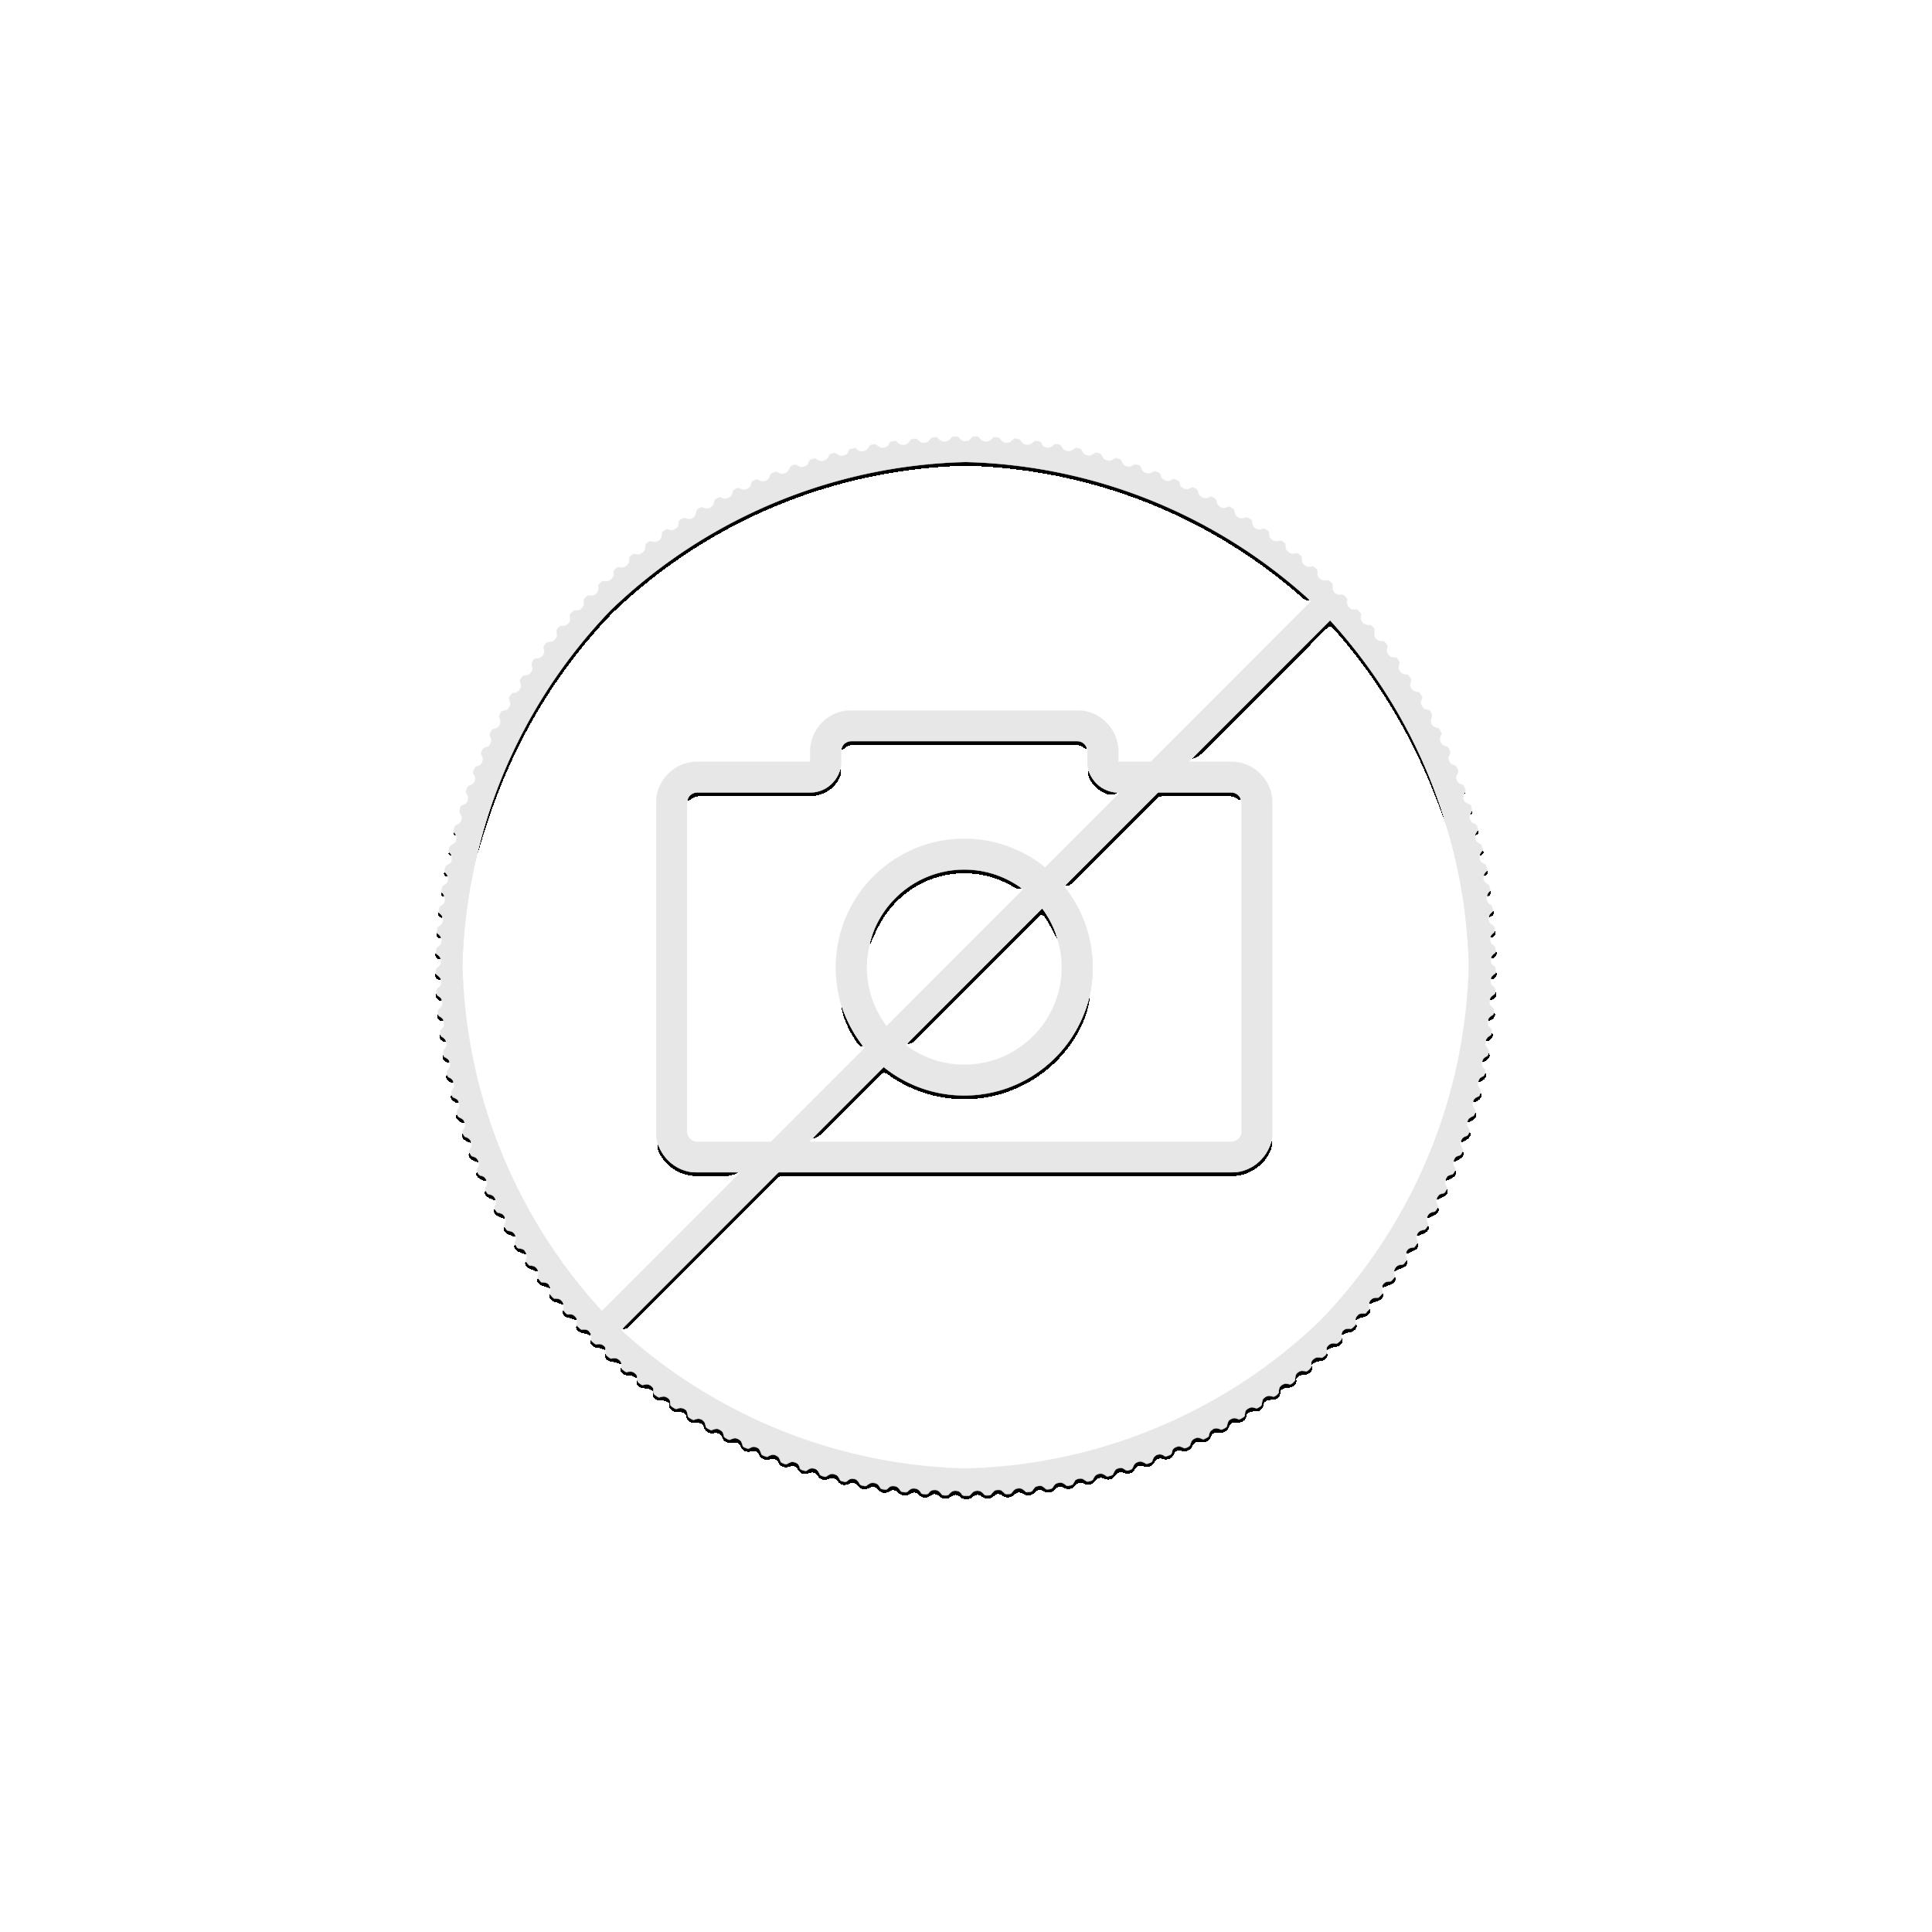 1 Troy ounce zilveren munt Manucodia 2019